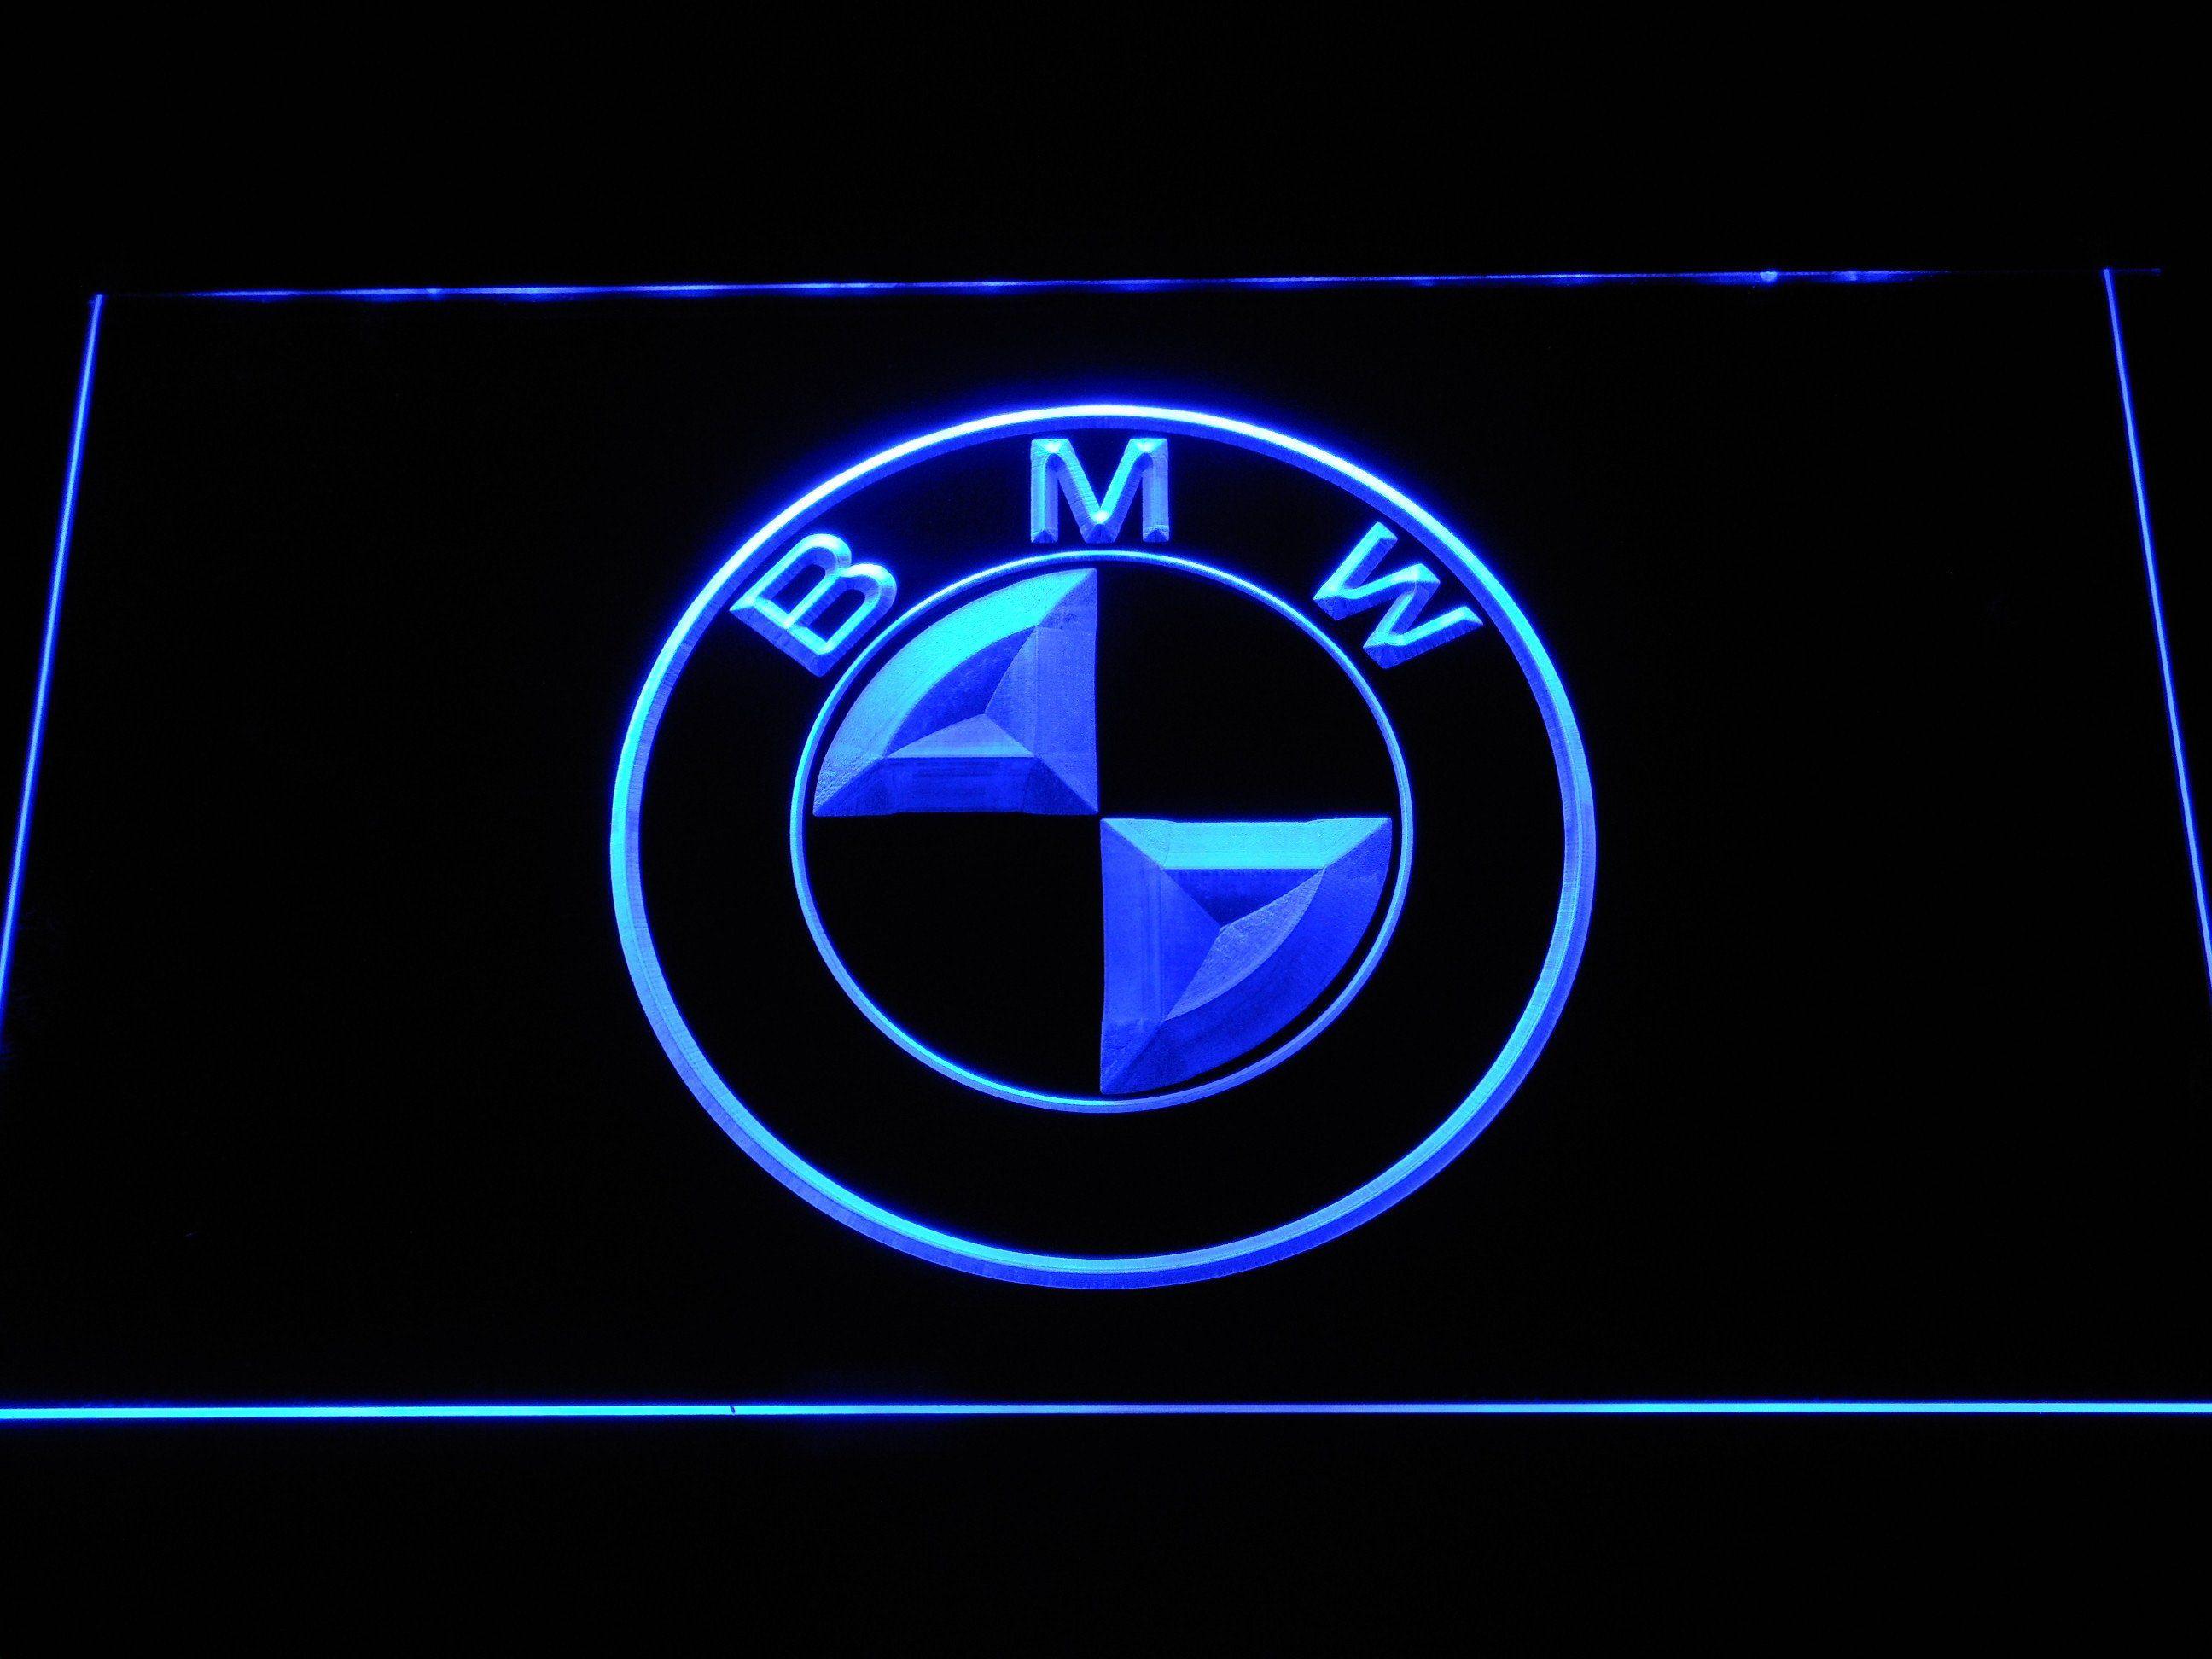 Bmw Logo Led Neon Sign Bmw Logo Bmw Led Neon Signs